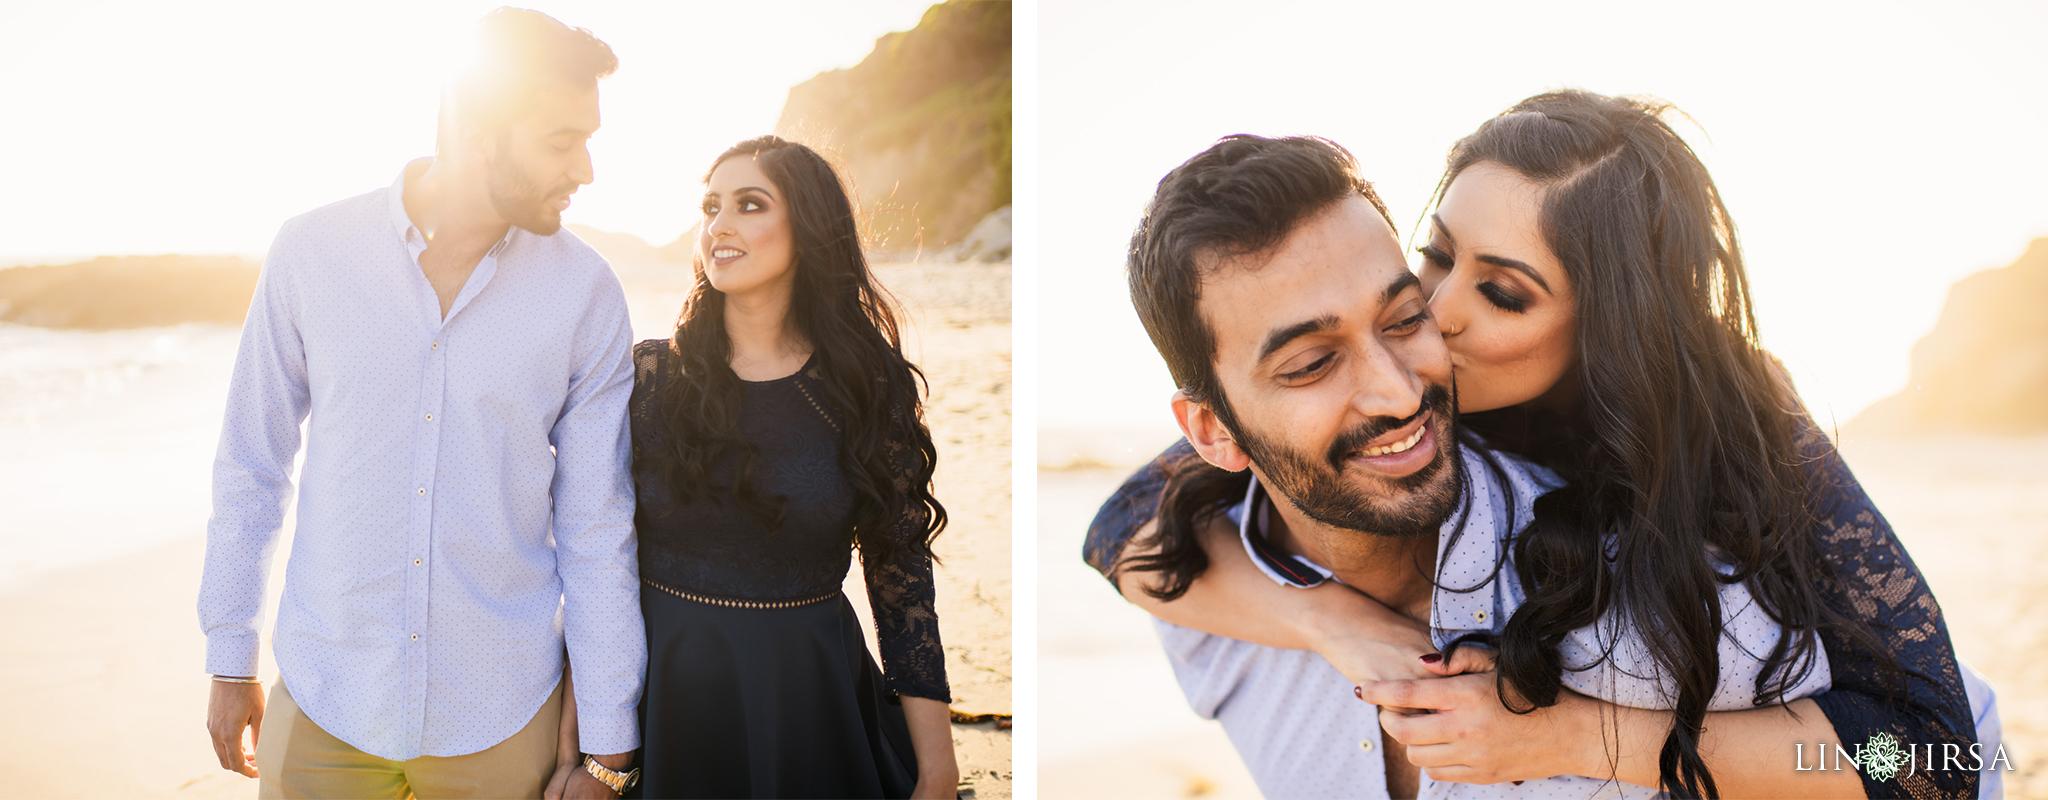 05 Heisler Park Laguna Beach Engagement Photography